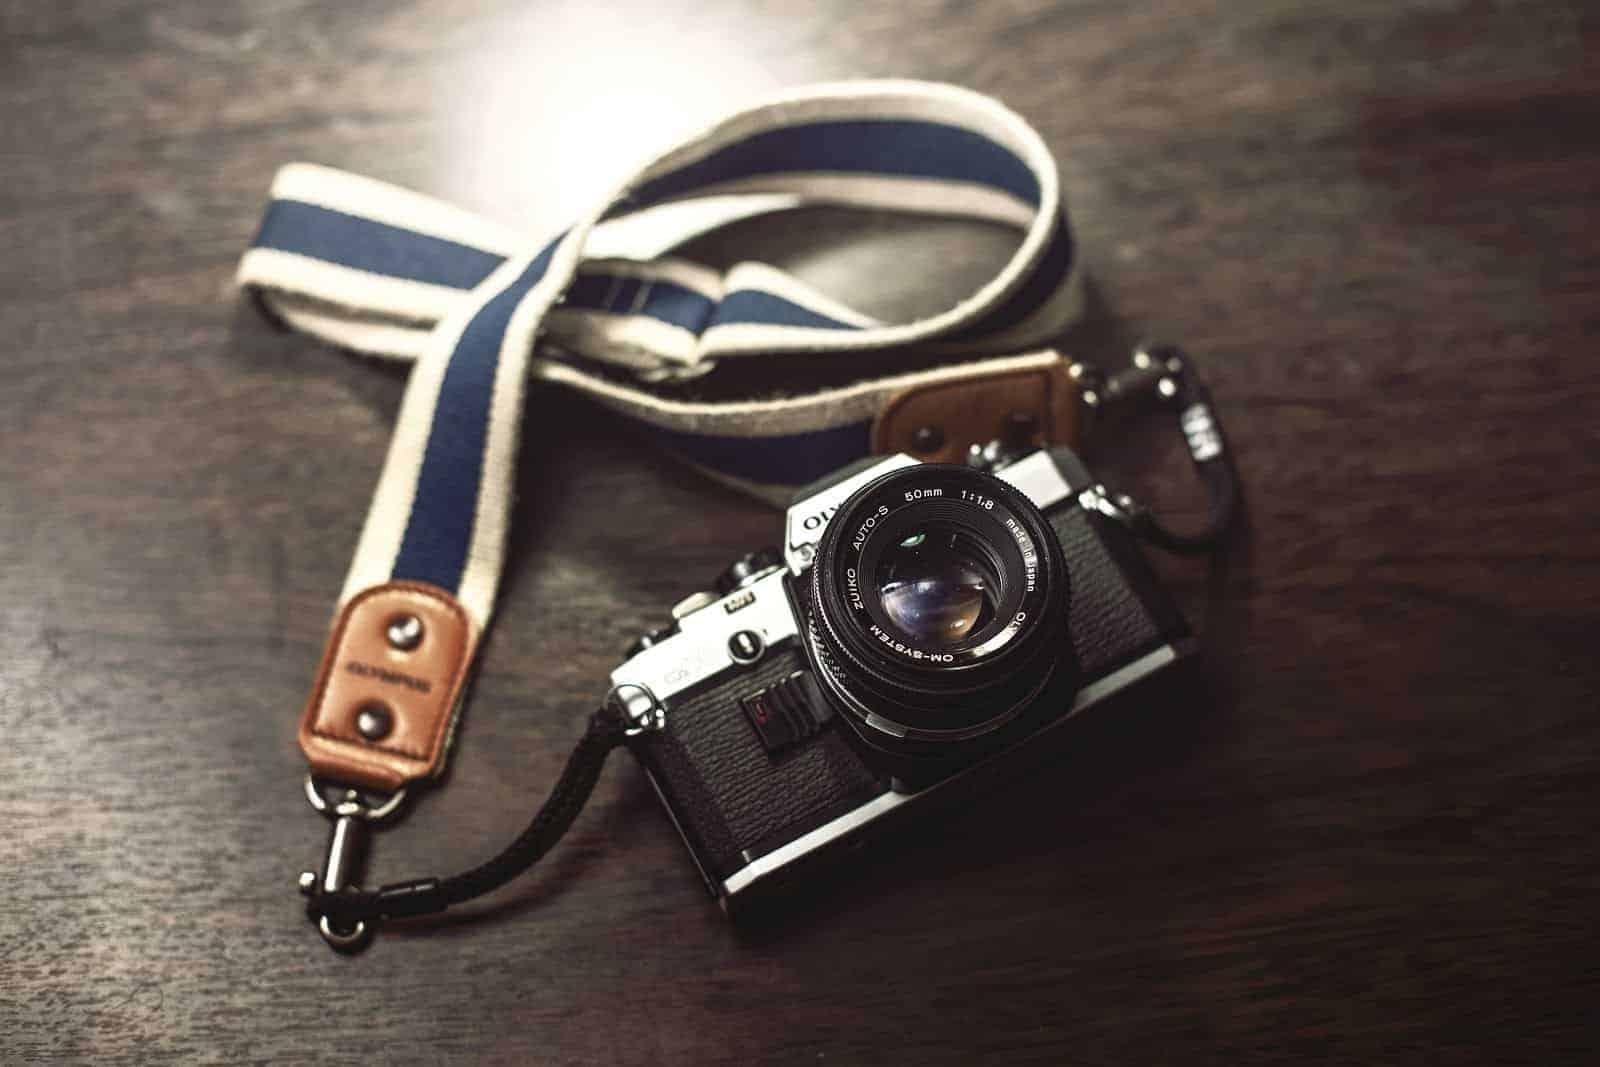 106dc7b2-8dff-4df2-9a5e-759612e303b9_camera-photography-vintage-technology-7658394